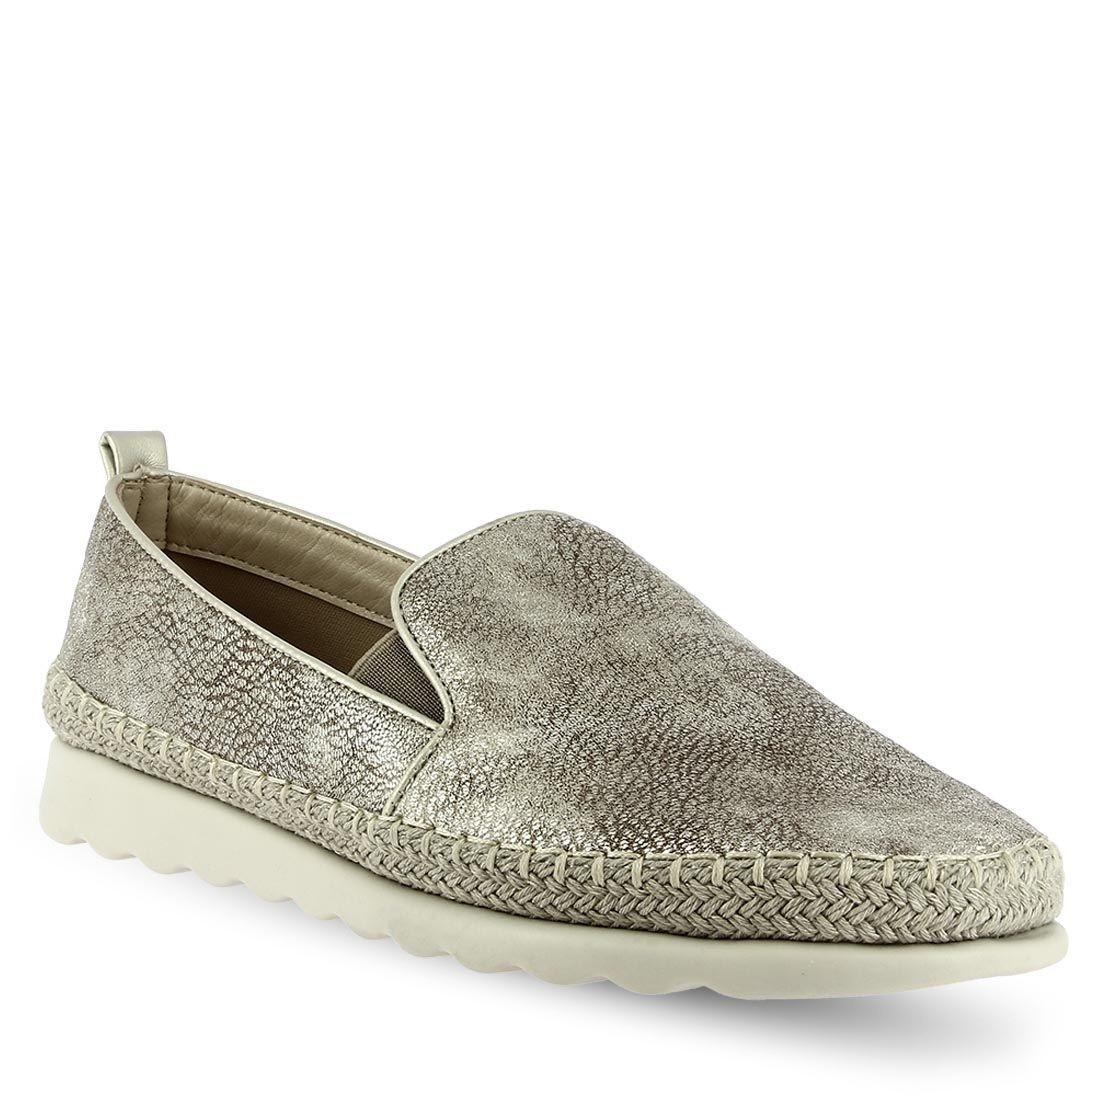 5d02f23fd72 PAREX Γυναικεία Παπούτσια Ανατομικά 12919000.P Πλατίνα-Χρυσό ...